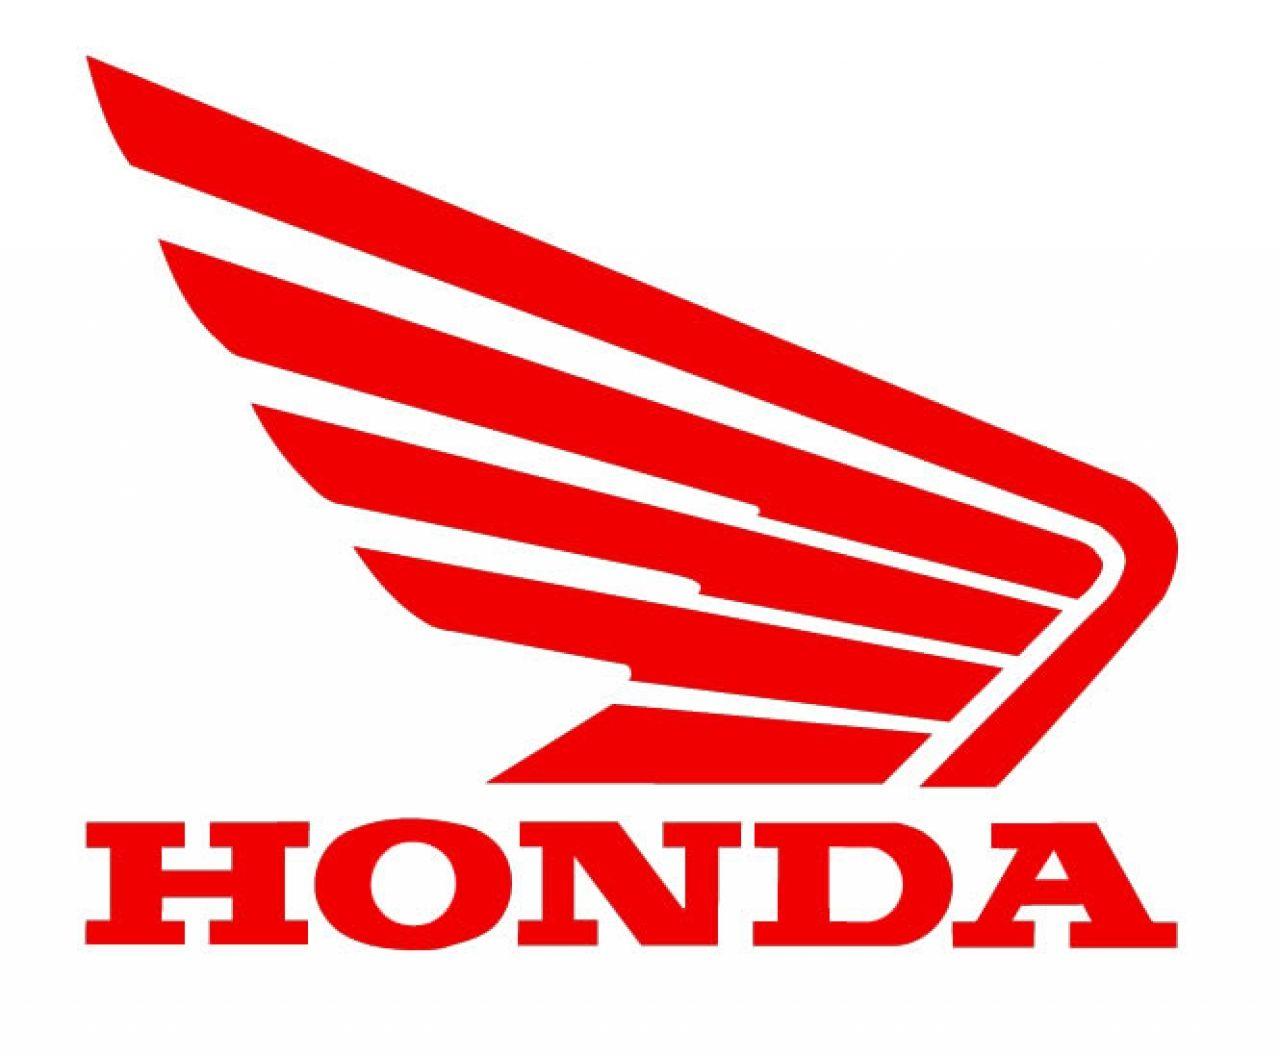 Honda motorcycles logo - Honda Motorcycle Logo Wallpaper Hd Background 9 Hd Wallpapers